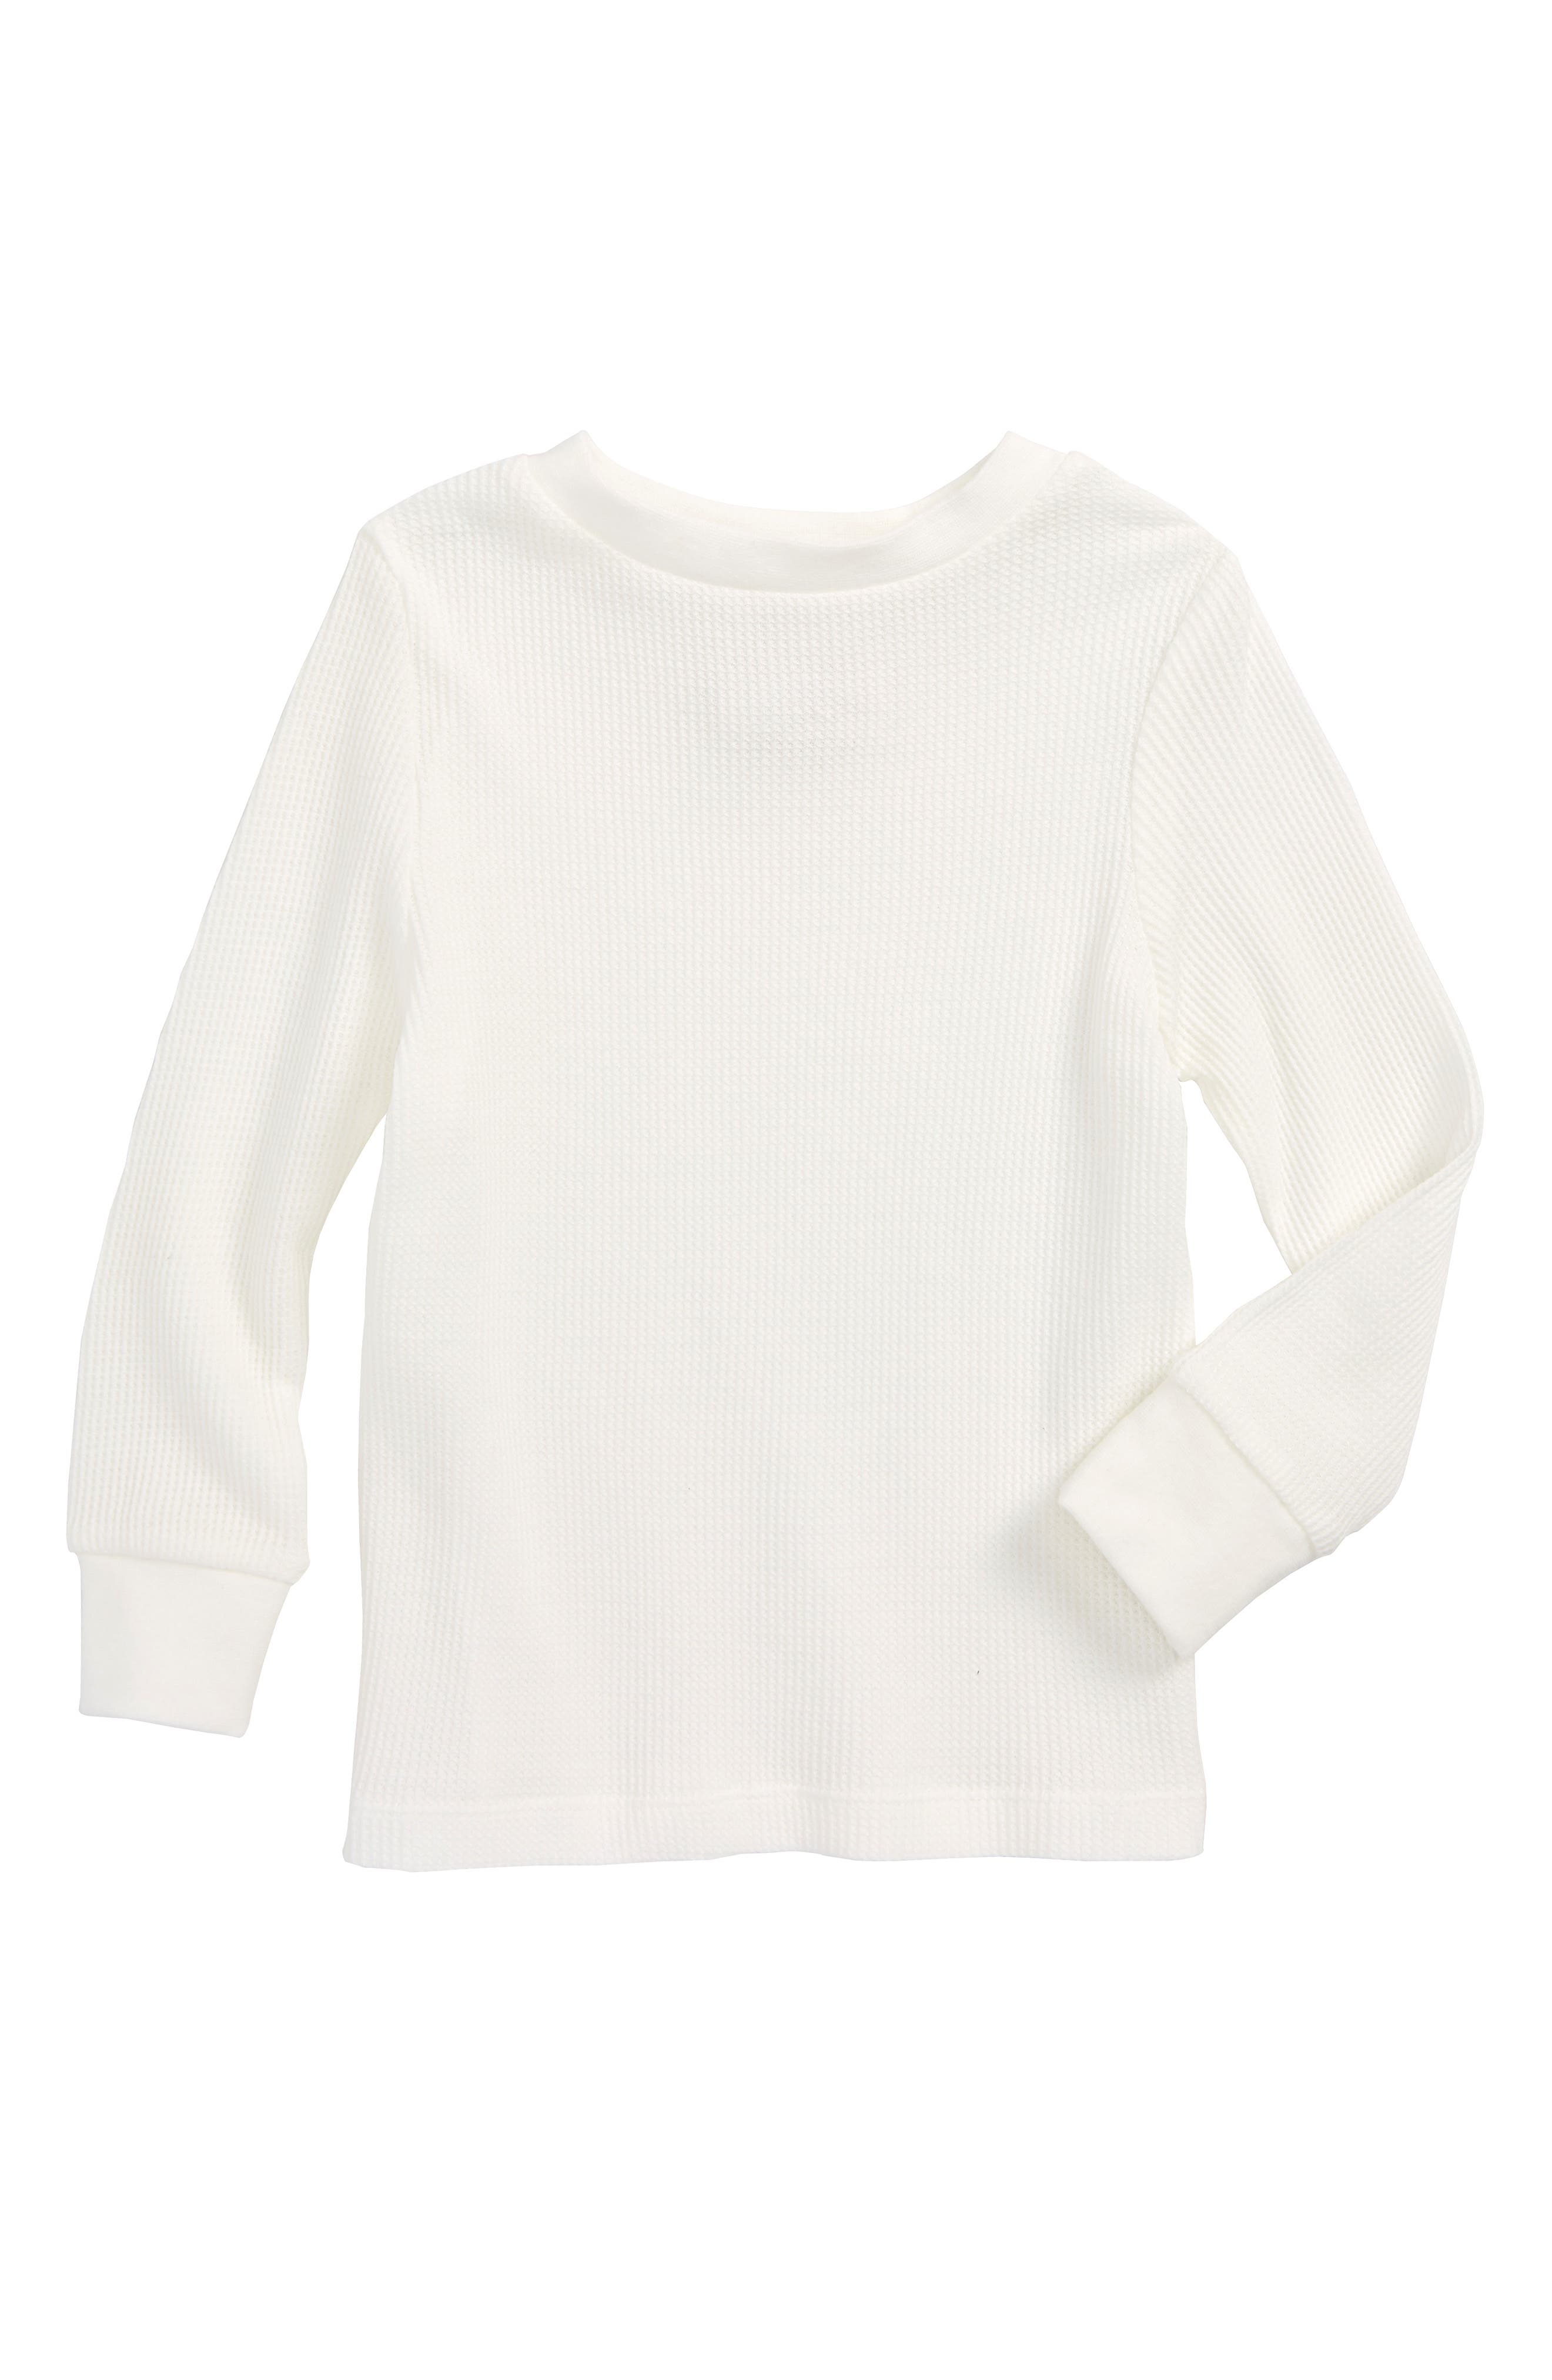 Peek Thermal T-Shirt (Toddler Boys, Little Boys & Big Boys)